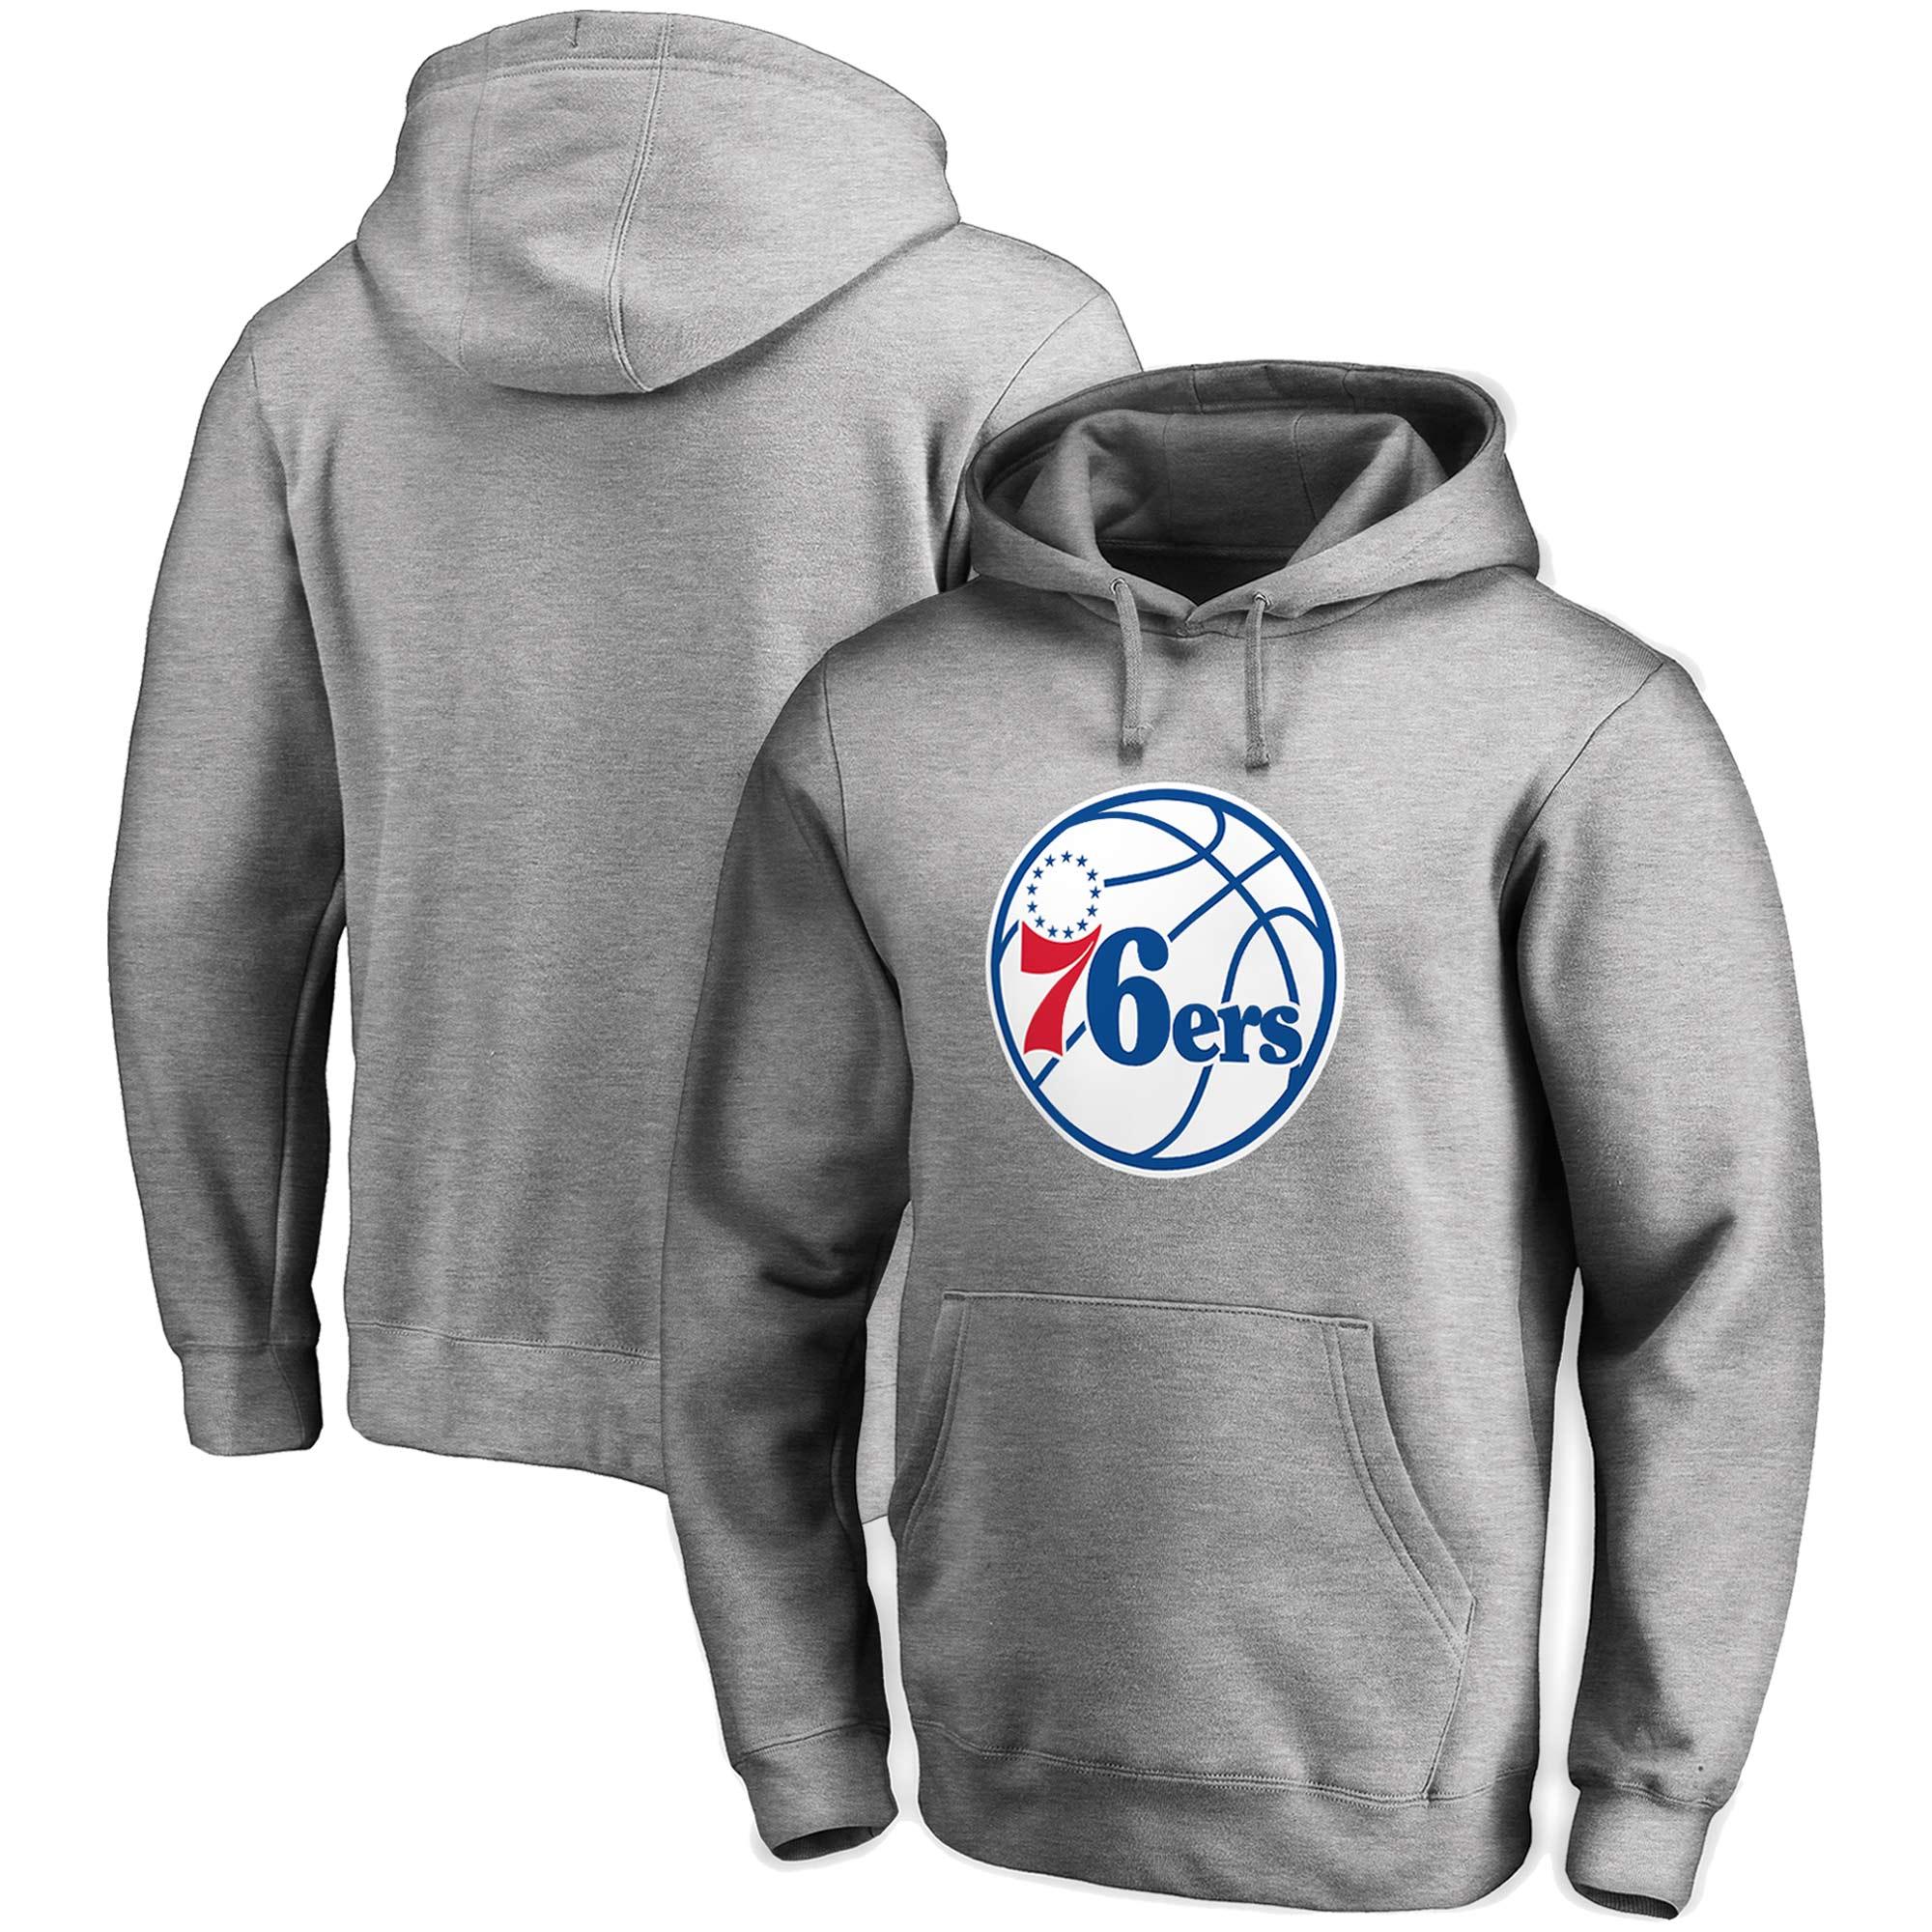 Philadelphia 76ers Fanatics Branded Primary Team Logo Pullover Hoodie - Heathered Gray